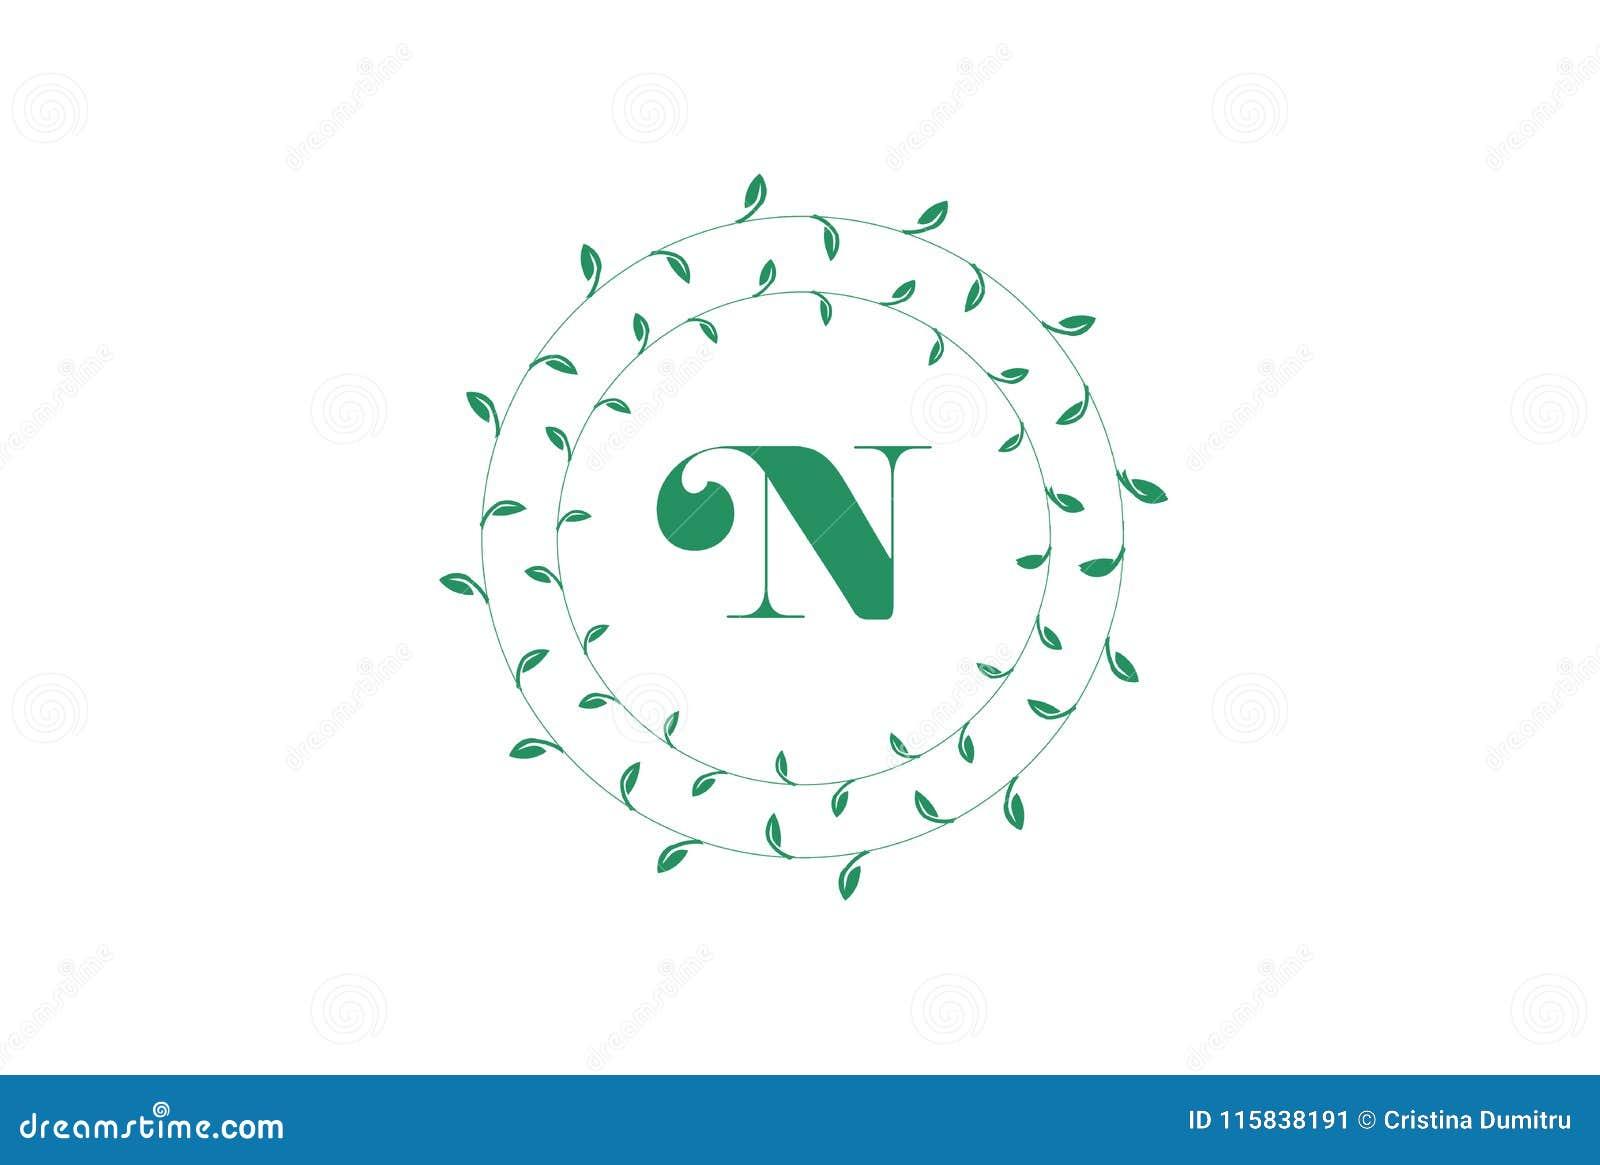 letter n logo with round green leaves elegant floral monogram template design